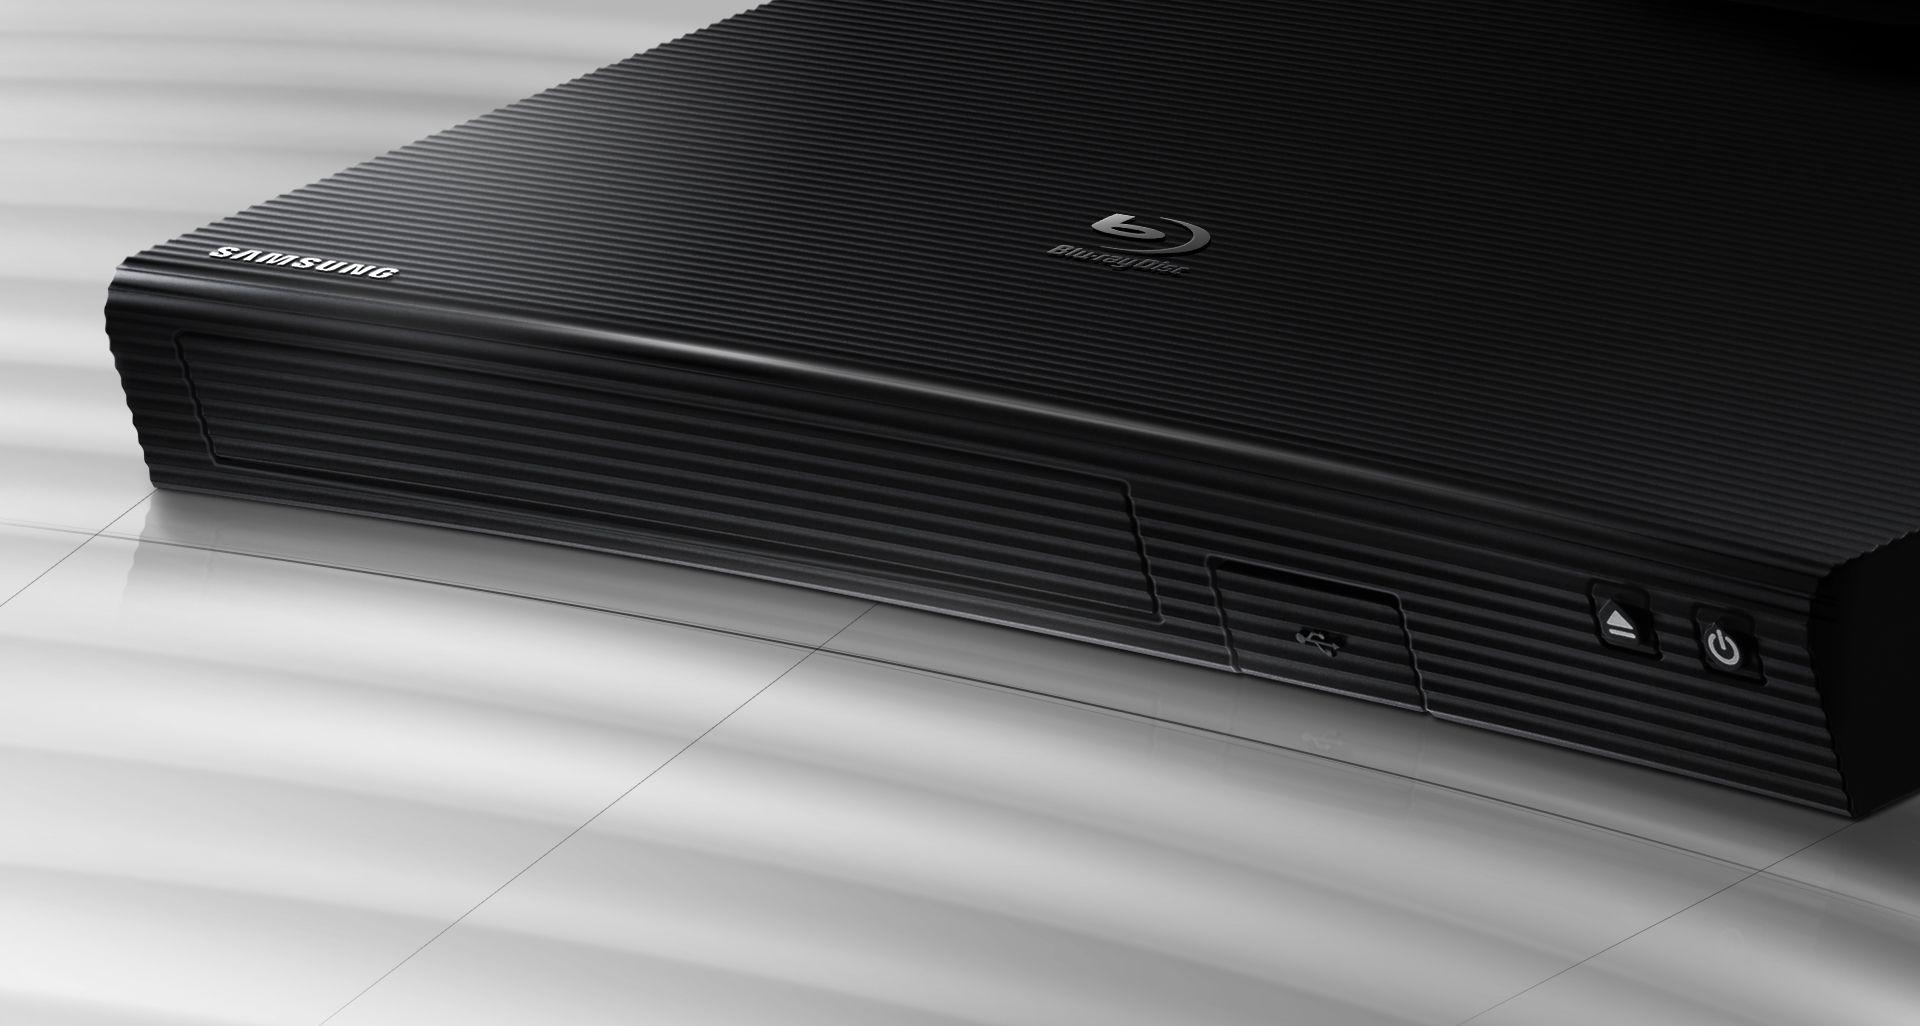 Blu-ray 3D SAMSUNG BD-J5500 Curvo 3D FHD -- 79 € Promoción limitada hasta fin de existencias http://www.materialdirecto.es/es/bluray-dvd/69487-samsung-bluray-bd-j5500-curvo-3d.html